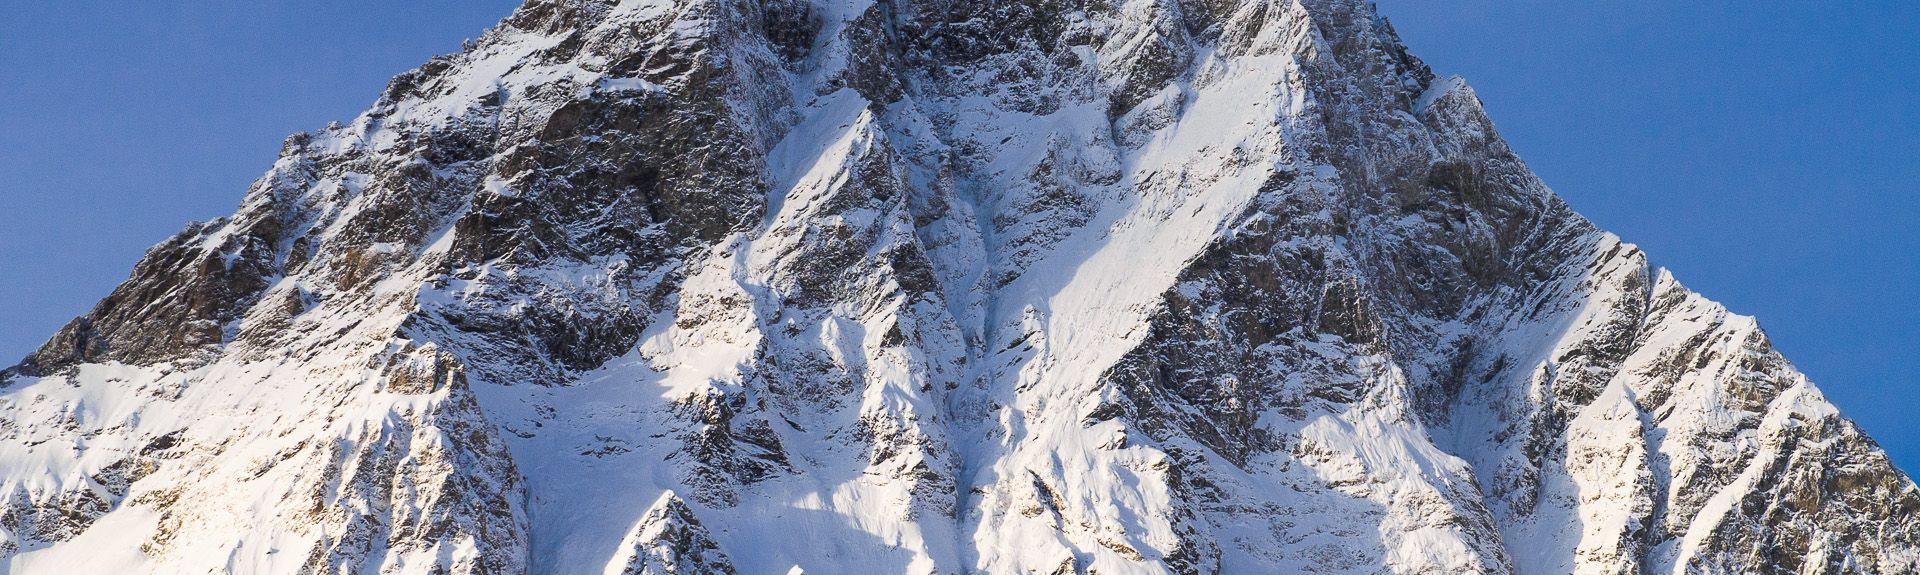 Gondel van Breuil-Cervinia, Cervinia, Valle d'Aosta, Italië